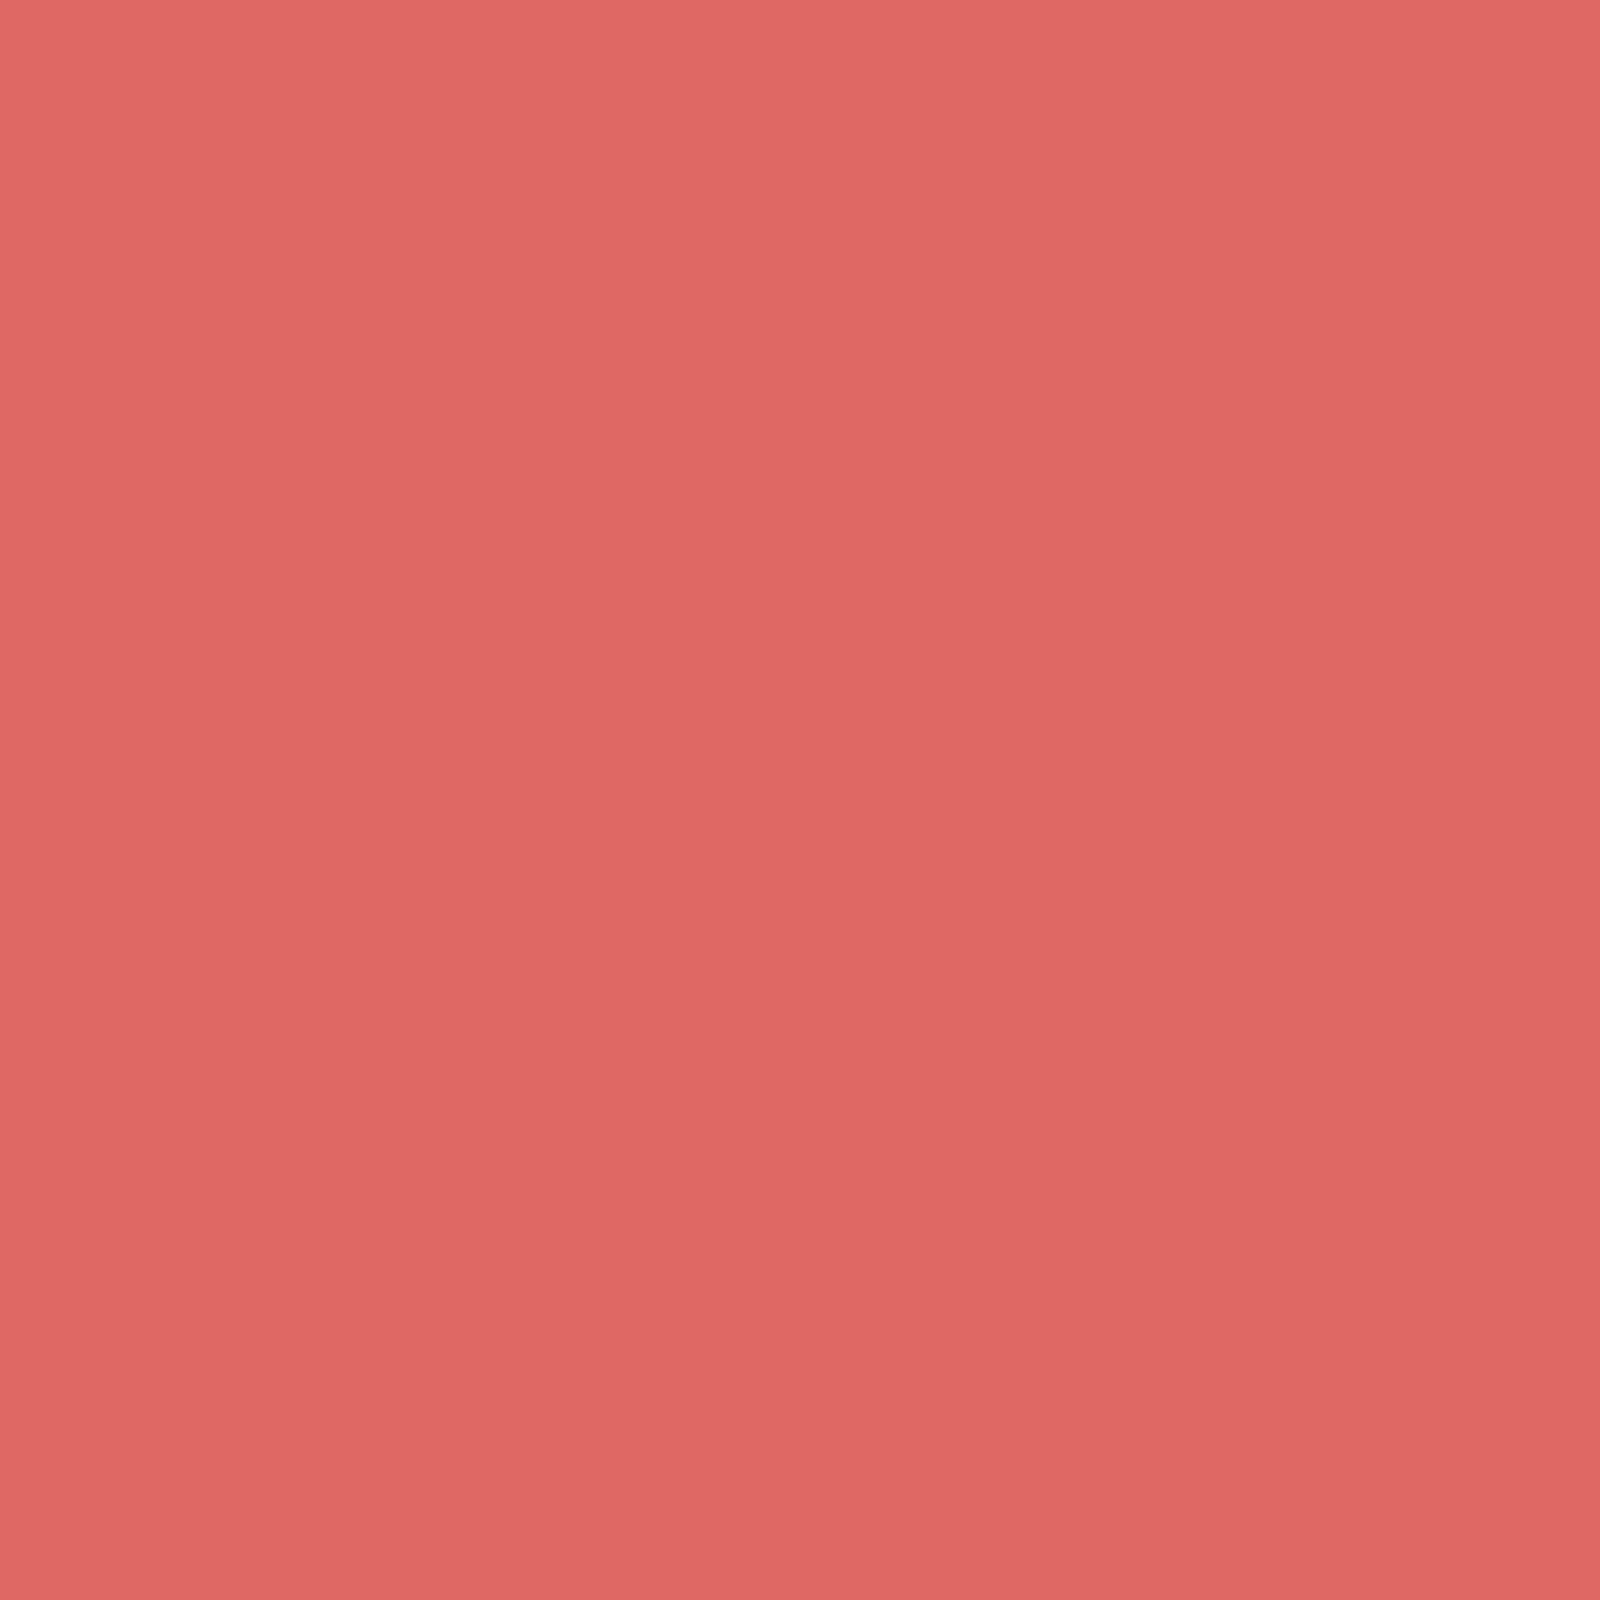 # 6729 Tangerine Dream